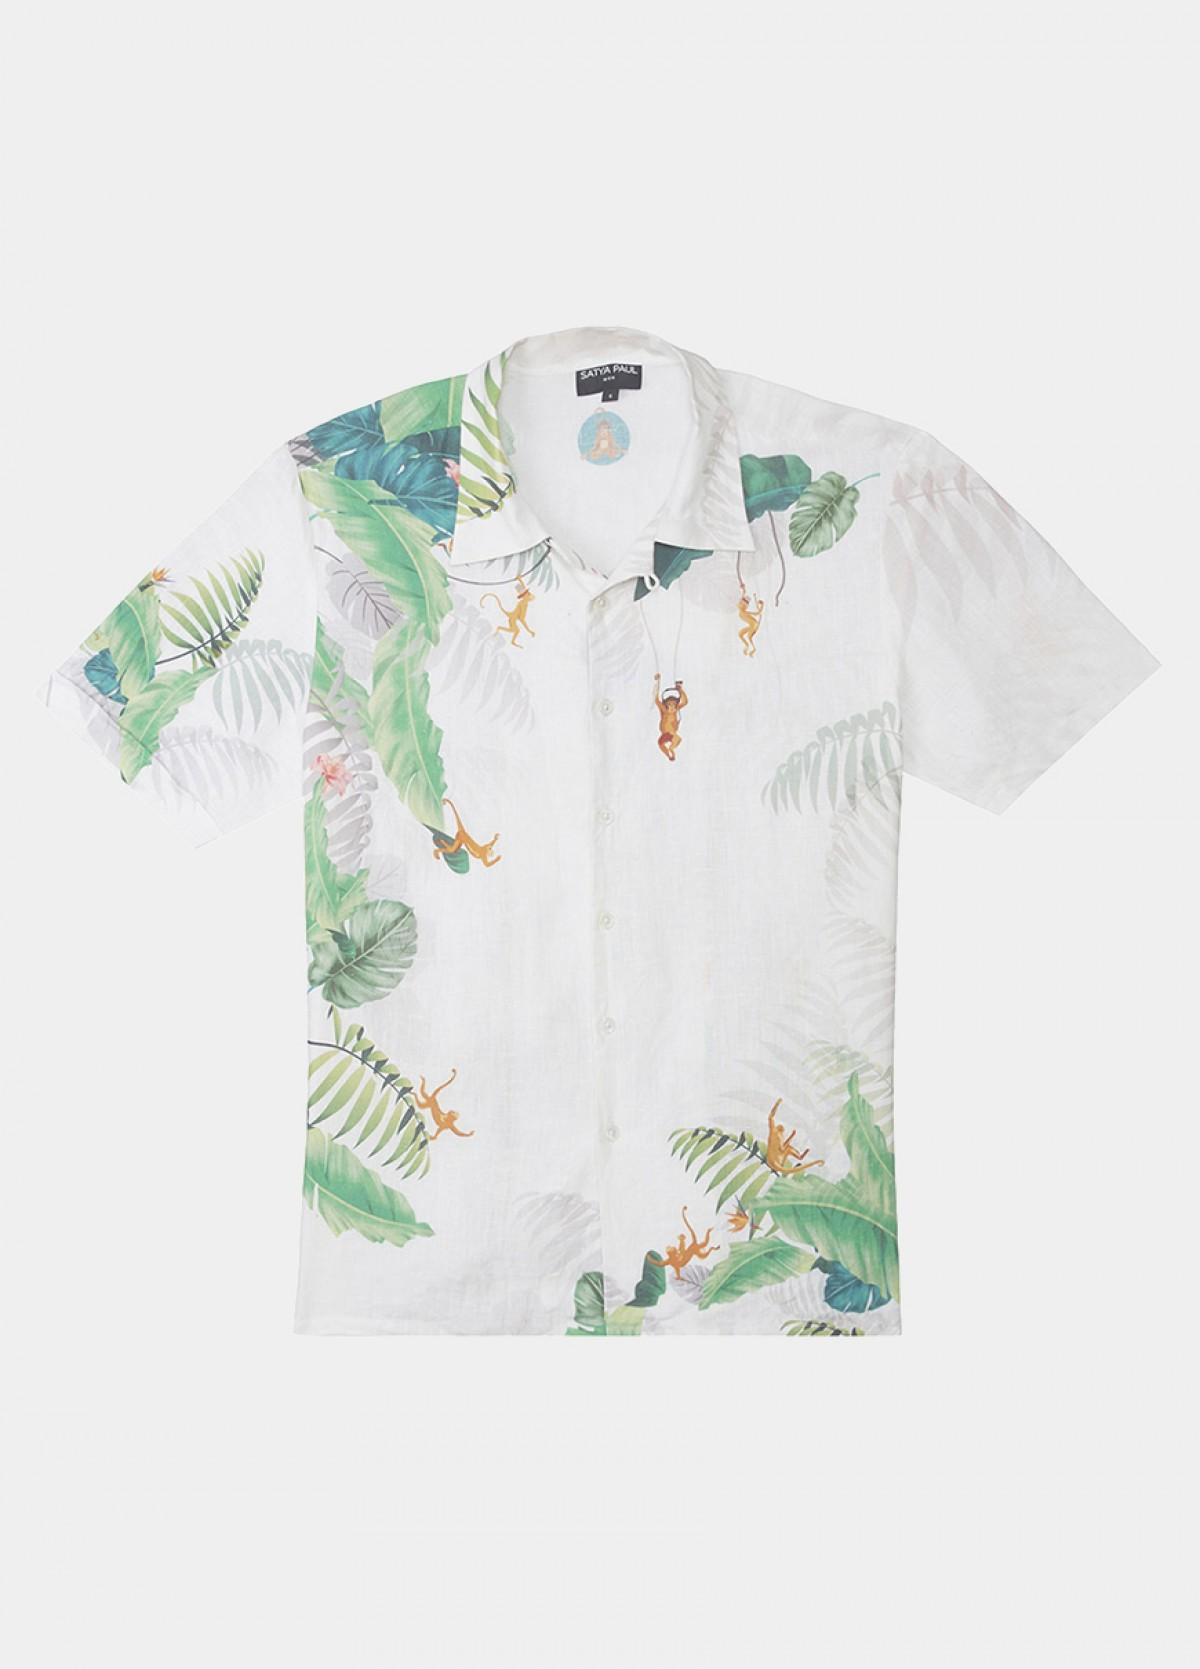 The Mangal Shirt